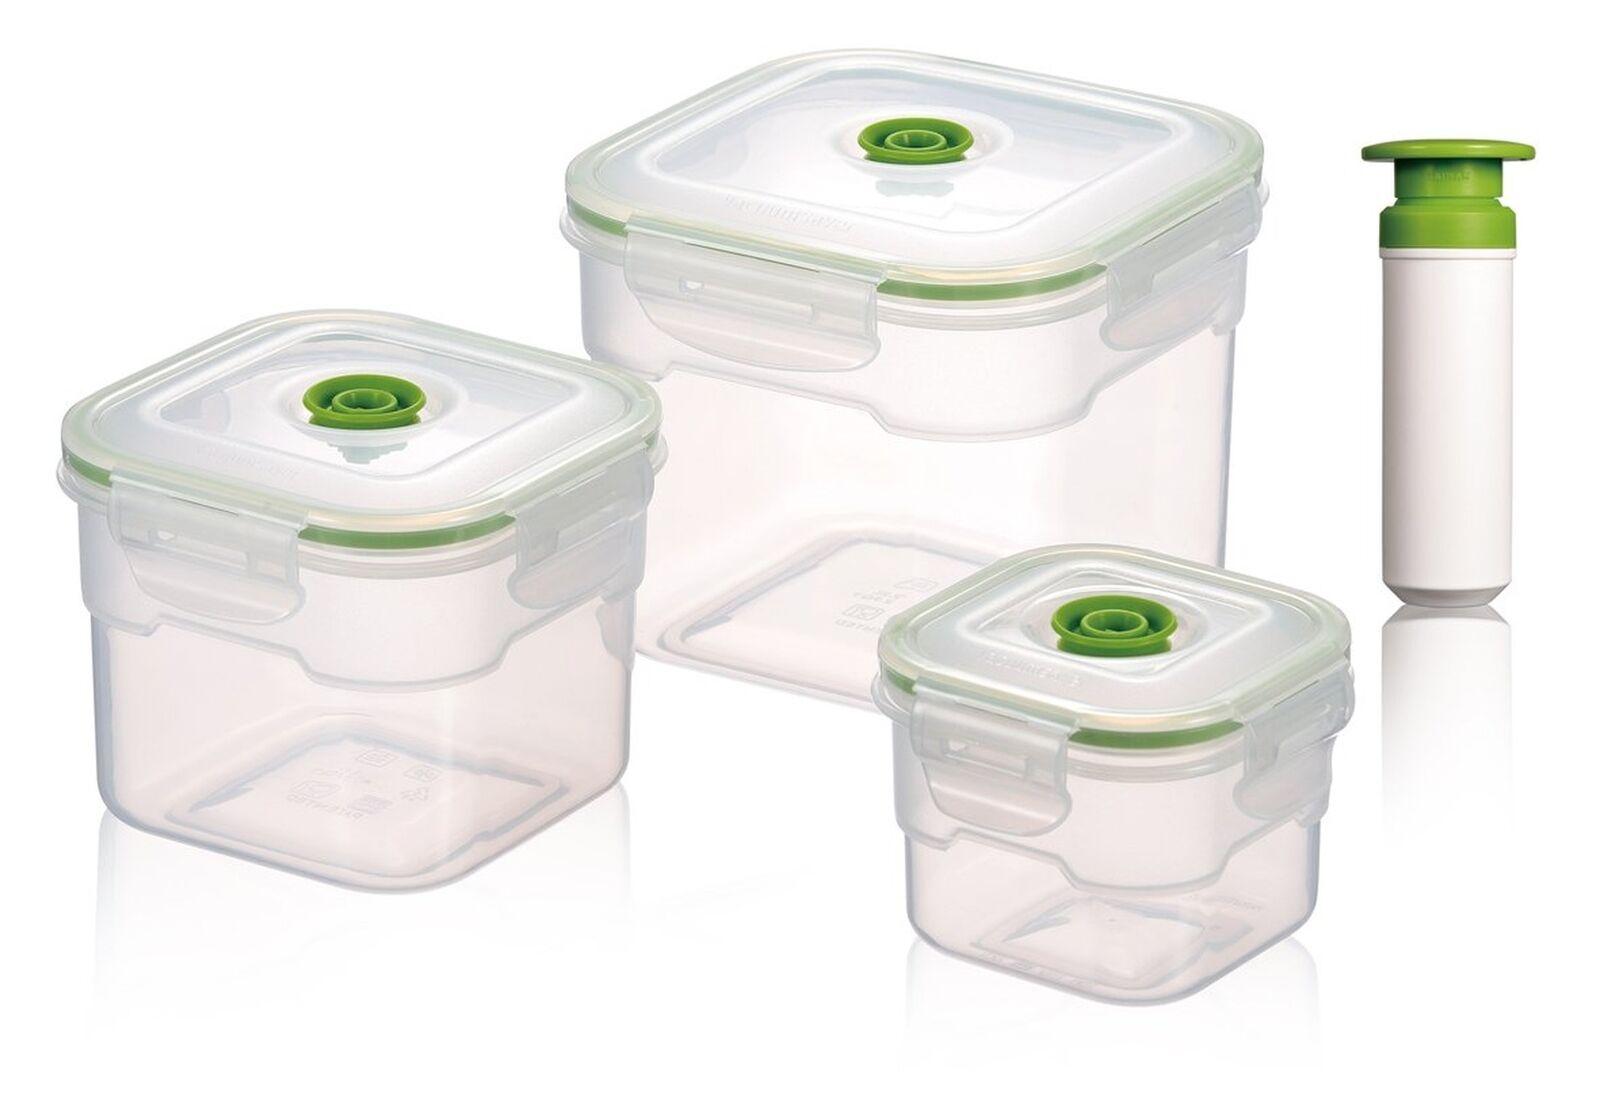 Vacuumsaver Flavia 3 piece food container set - with vacuum pump